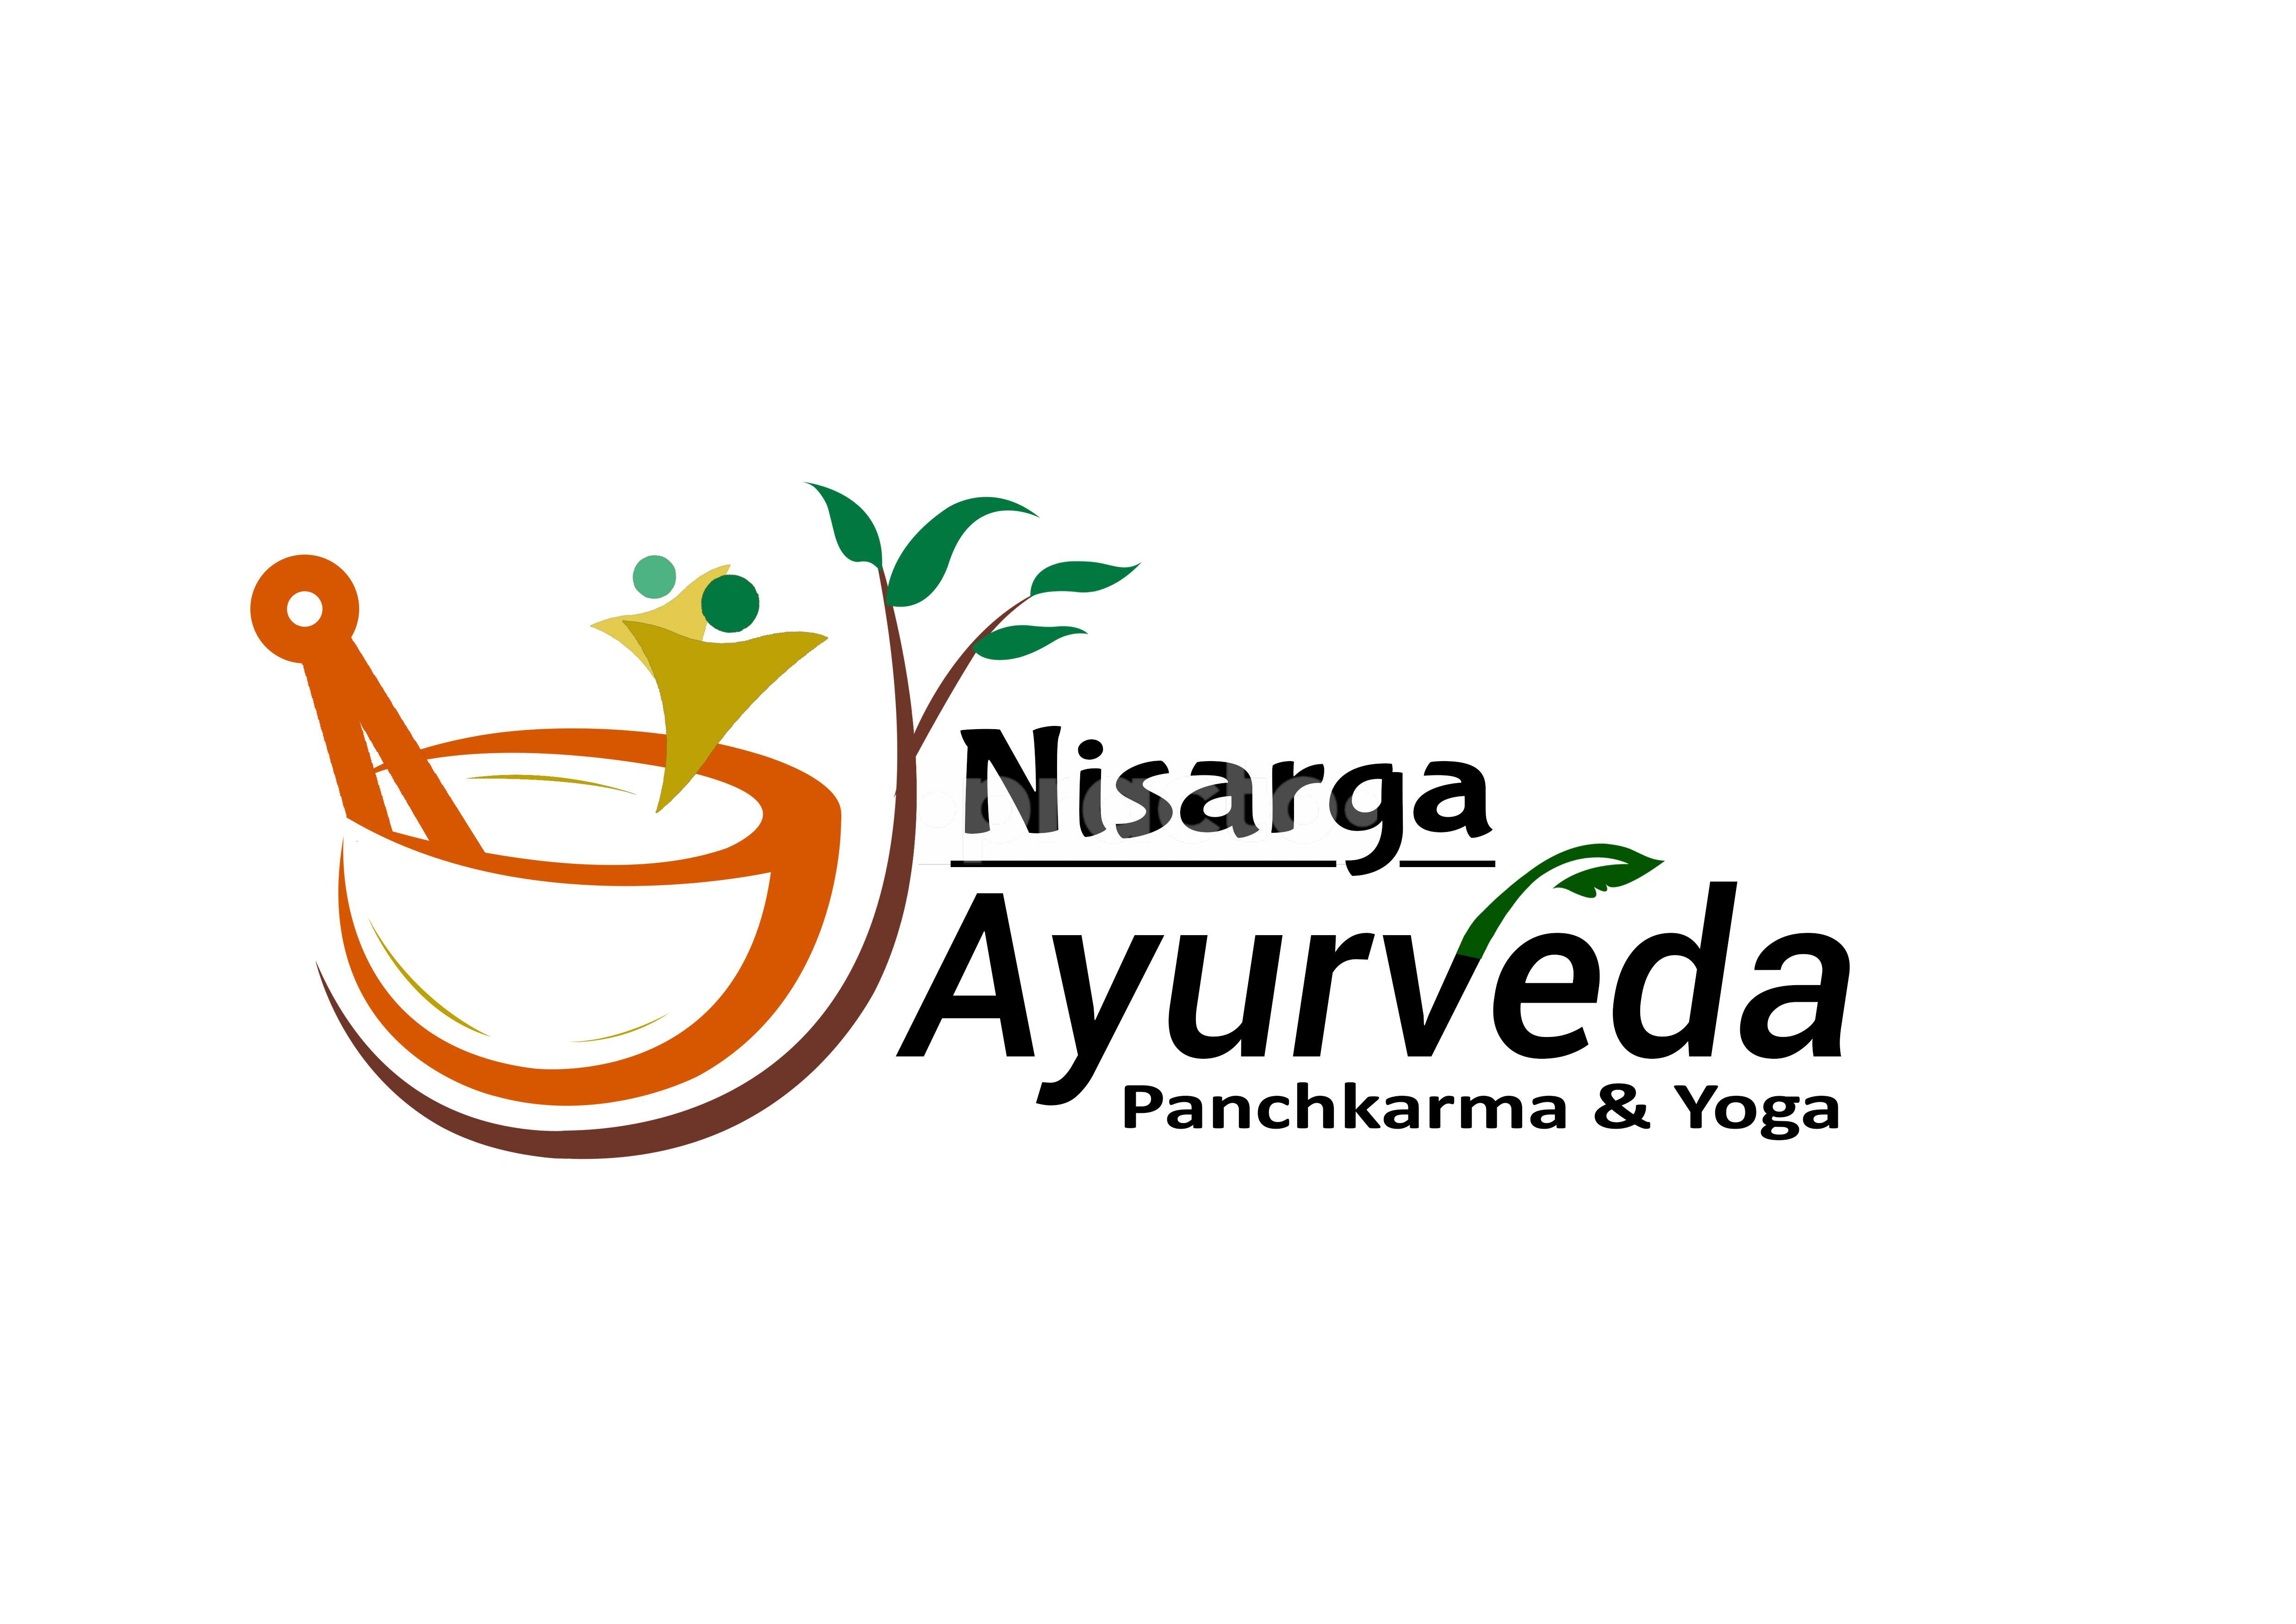 Nisarg Ayurvedic Clinic & Panchkarma Centre